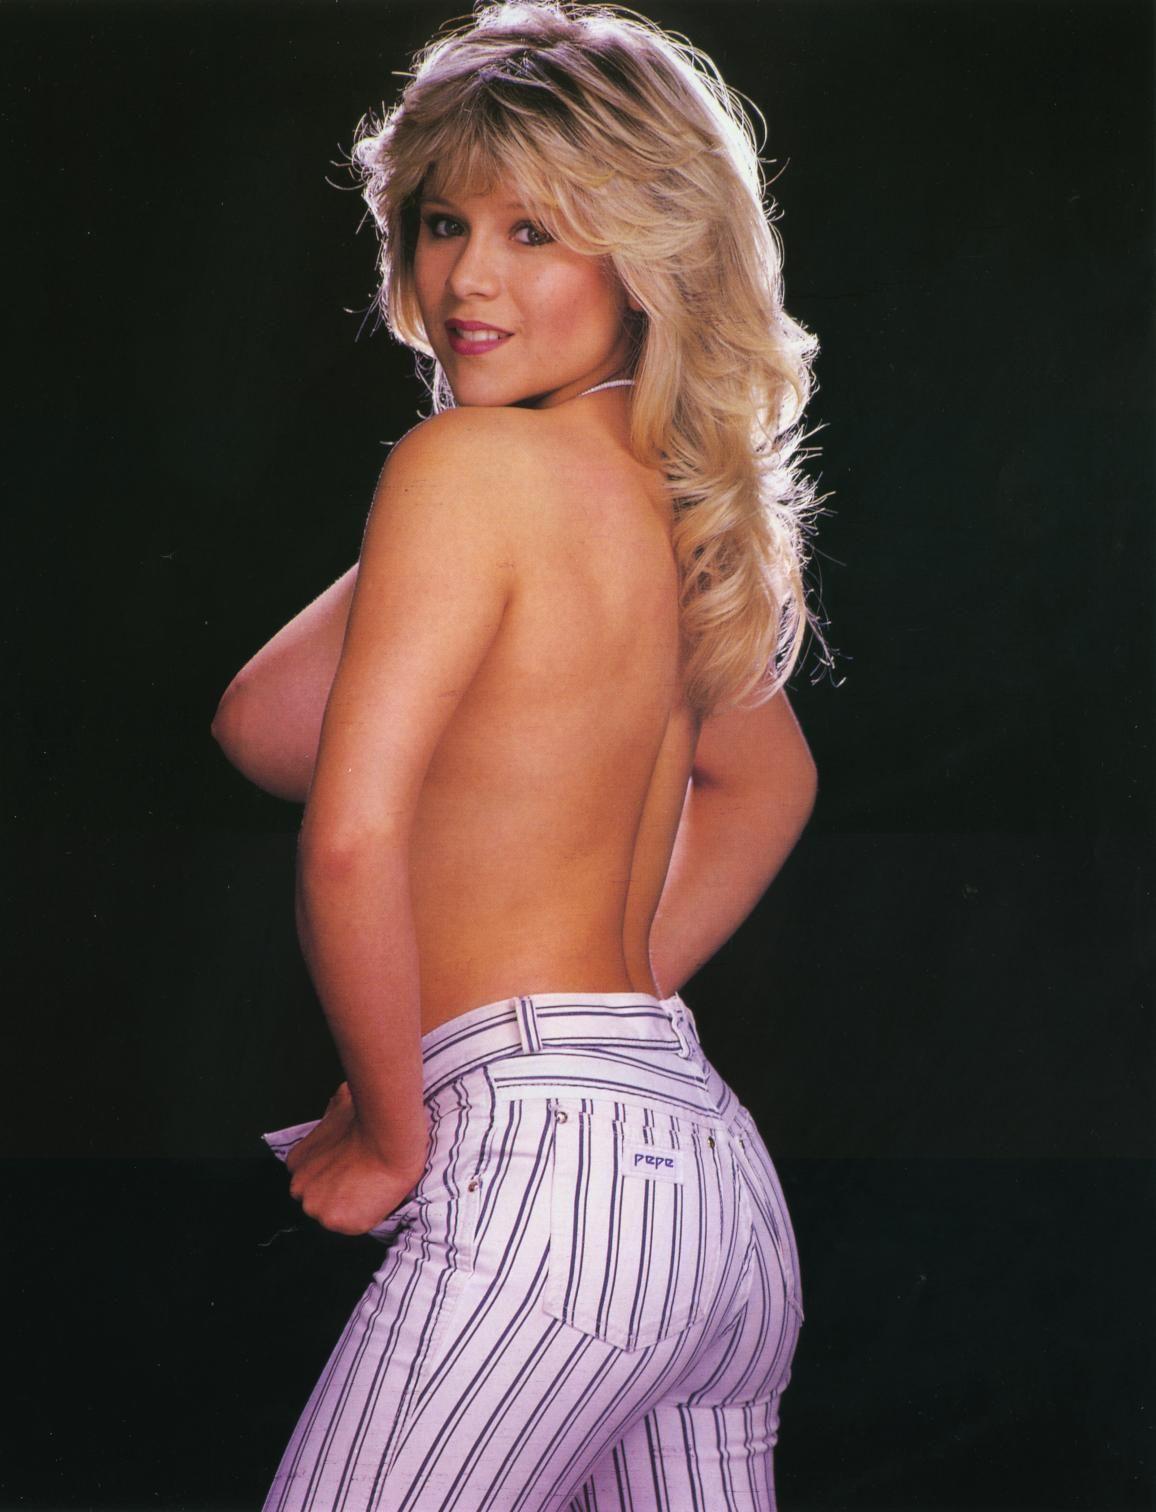 Megan fox nude breast